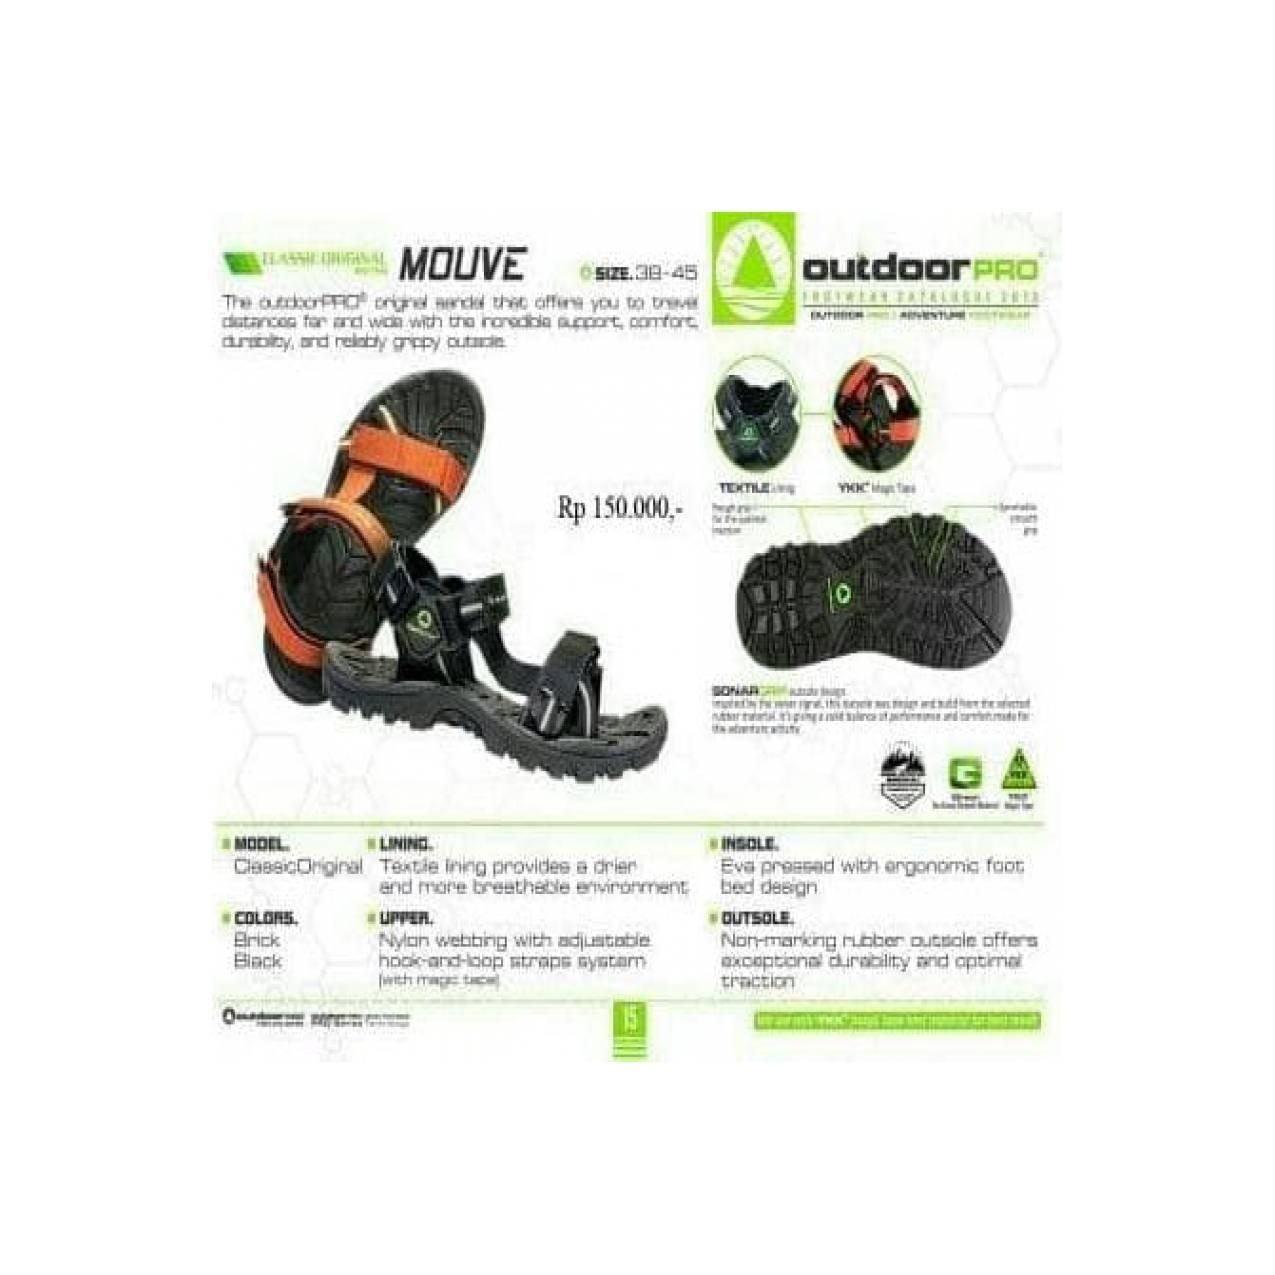 Jual Sandal Gunung Outdoor Pro Seri Mouve Not Eiger Consina Rei Boogie